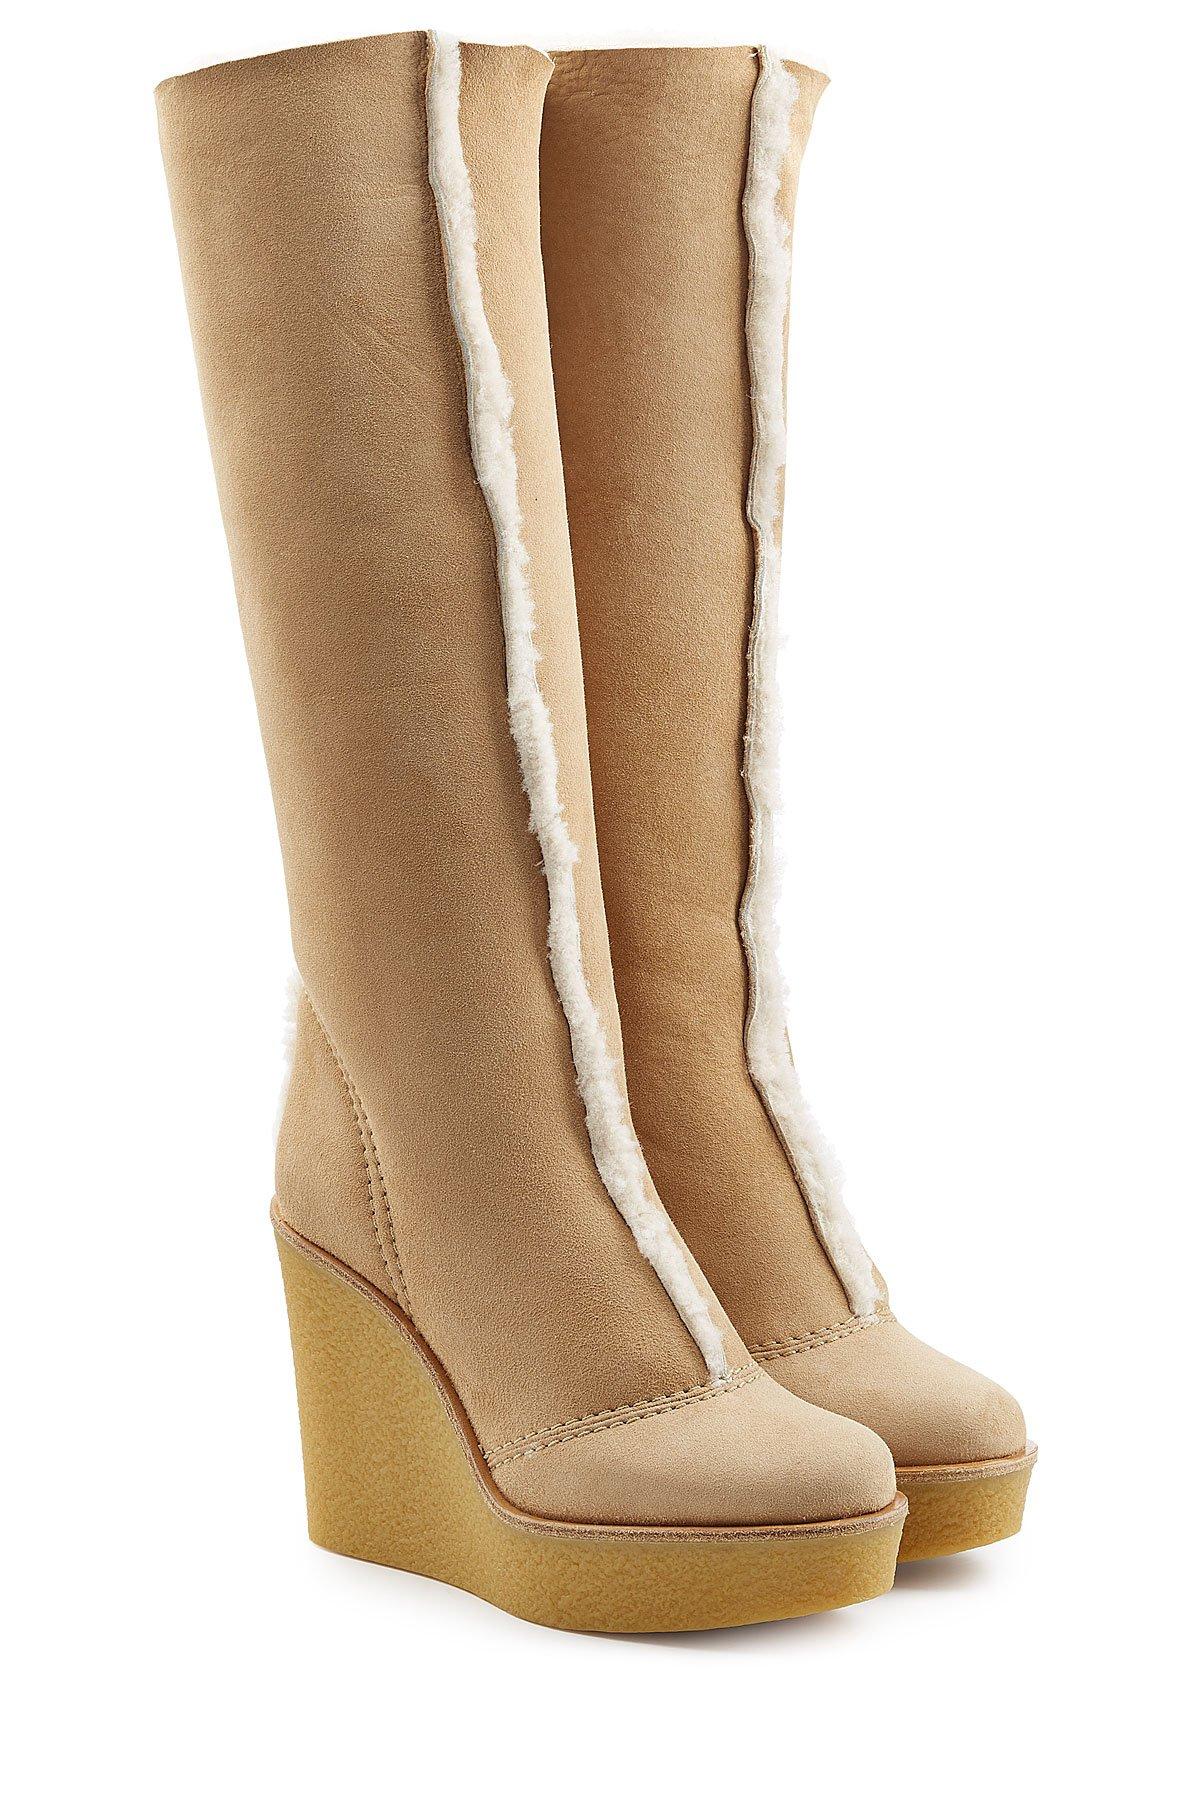 chlo chlo shearling knee boots beige in brown lyst. Black Bedroom Furniture Sets. Home Design Ideas